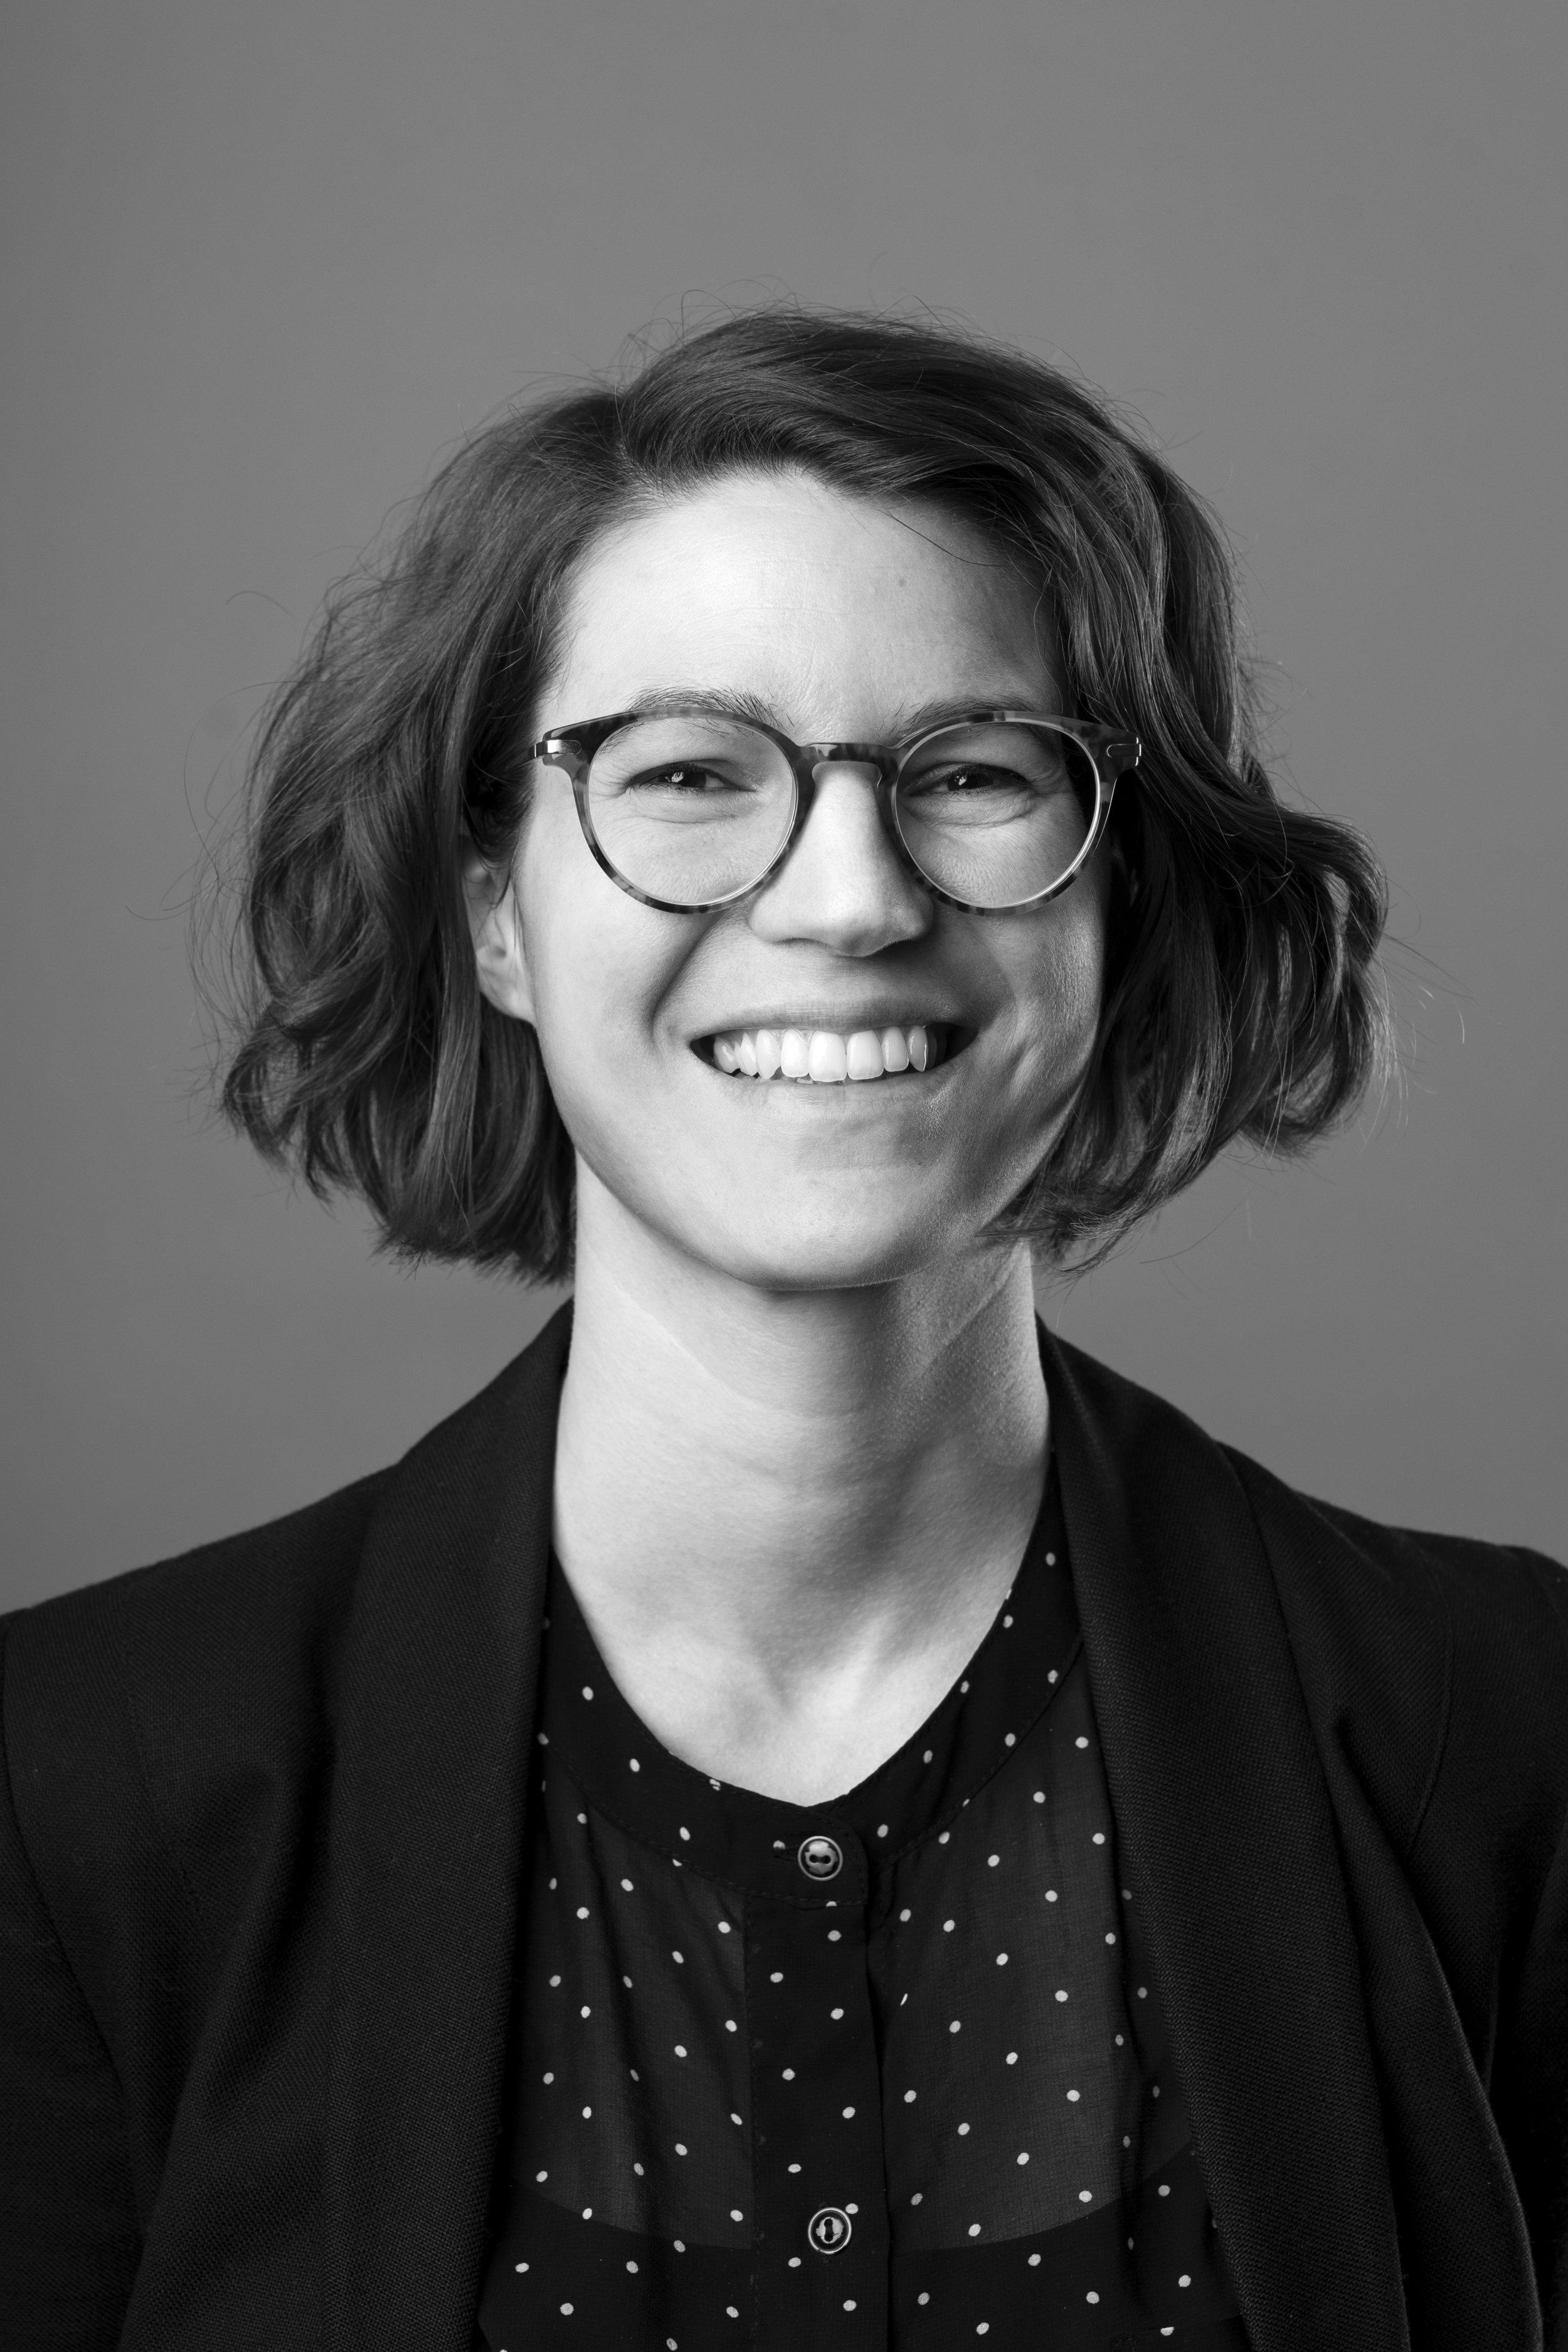 Miriam Hagmann-Schlatterbeck